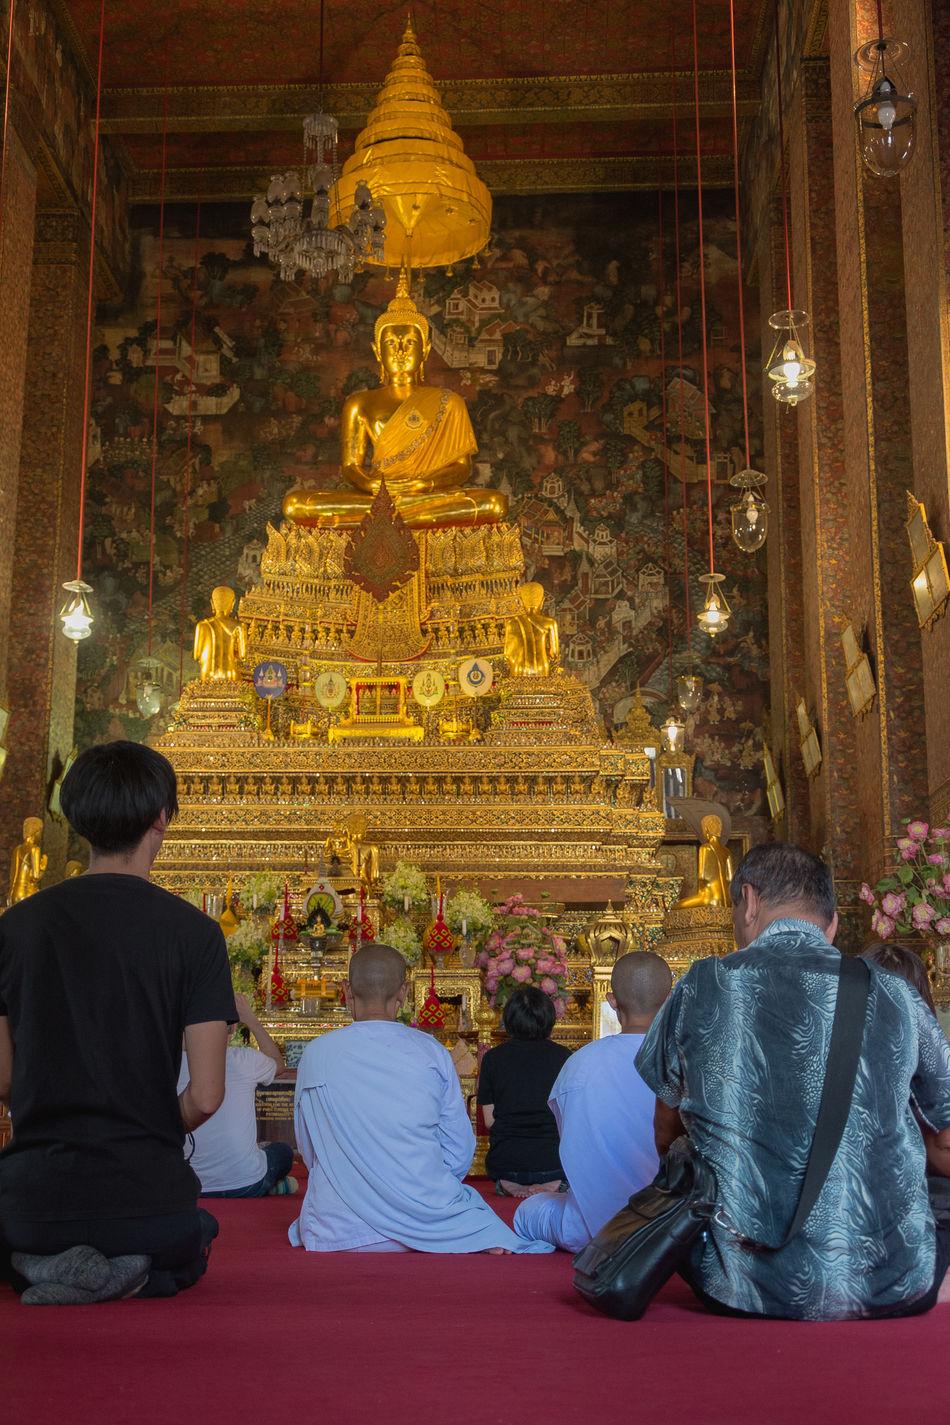 El maravilloso templo del Buda Reclinado. Wat Pho, Bangkok, Thailand. ASIA Bangkok Buddha Buddhism Buddhism Culture Buddhist Temple Budismo Meditation Reclining Buddha Statue Stupa Temple Templo Thailand Travel Travel Destinations Travel Photography Traveling